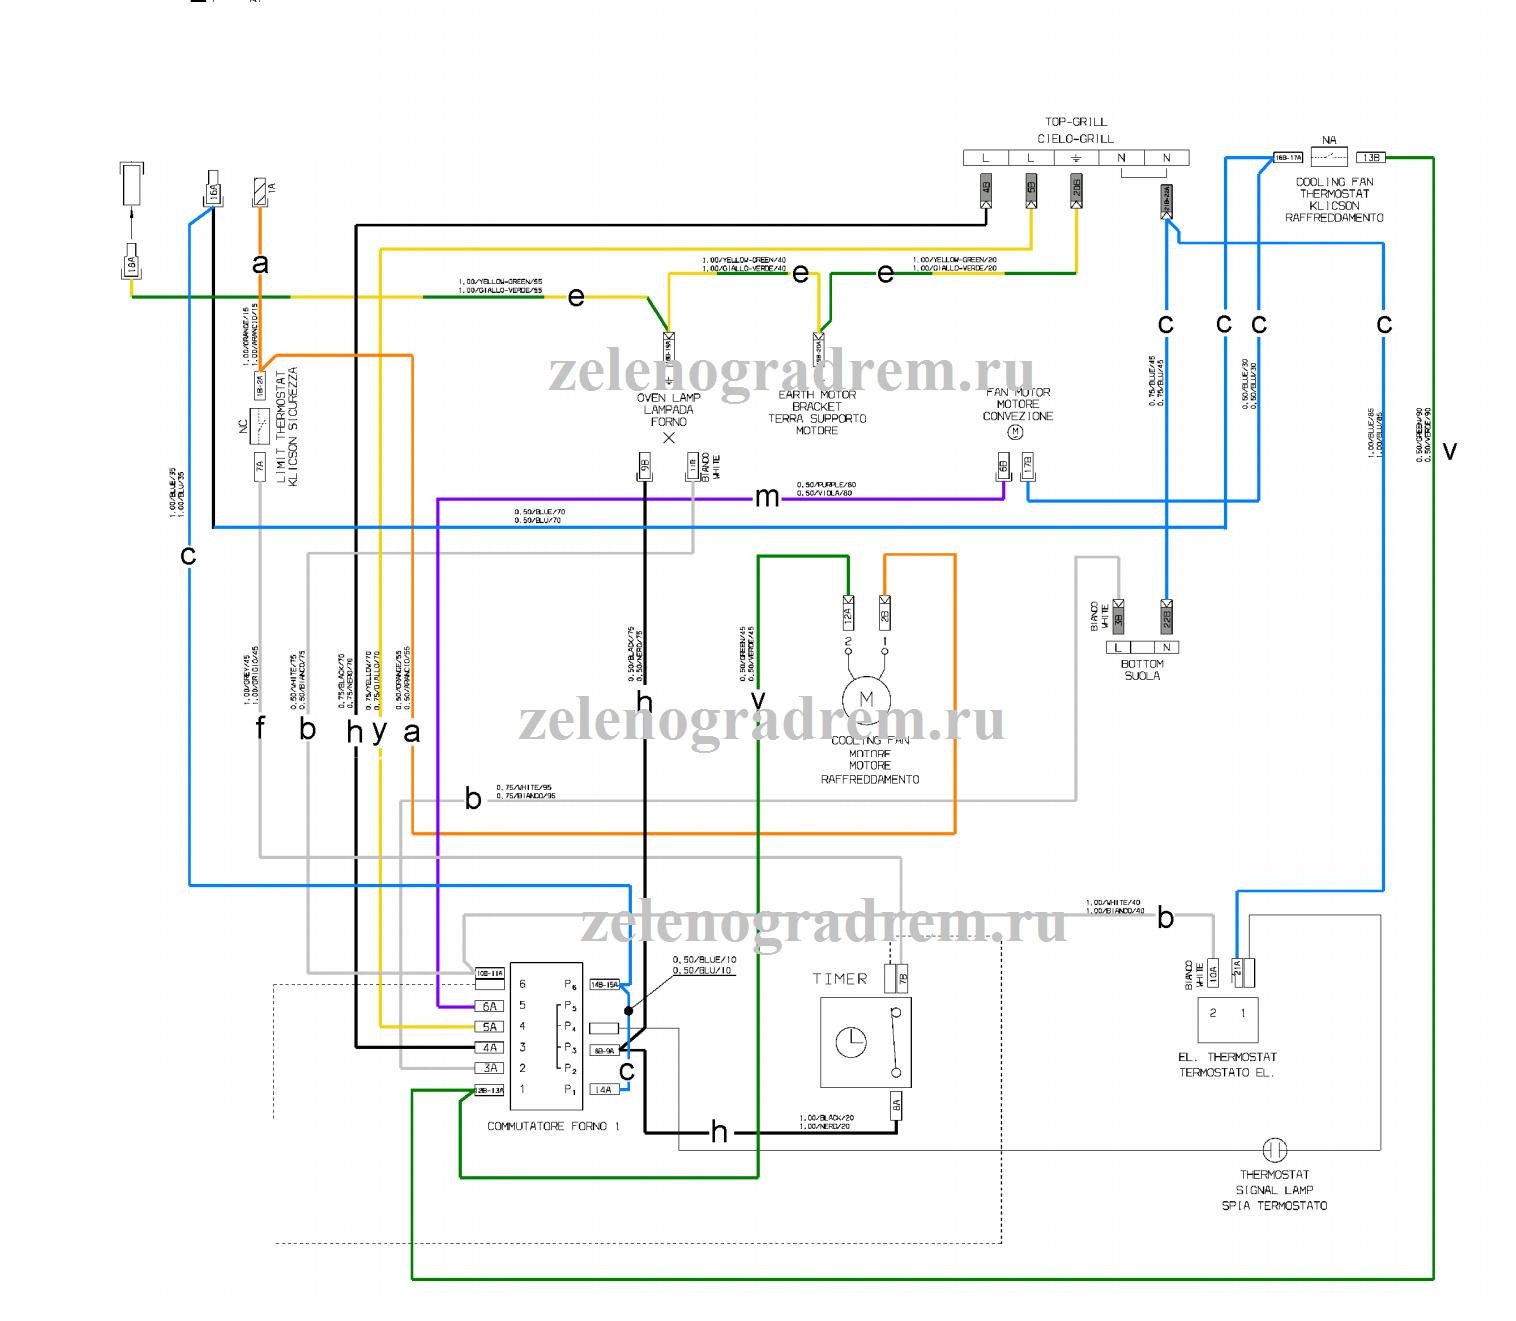 chema-duhovogo-shkafa-s-mehanich-taymerom